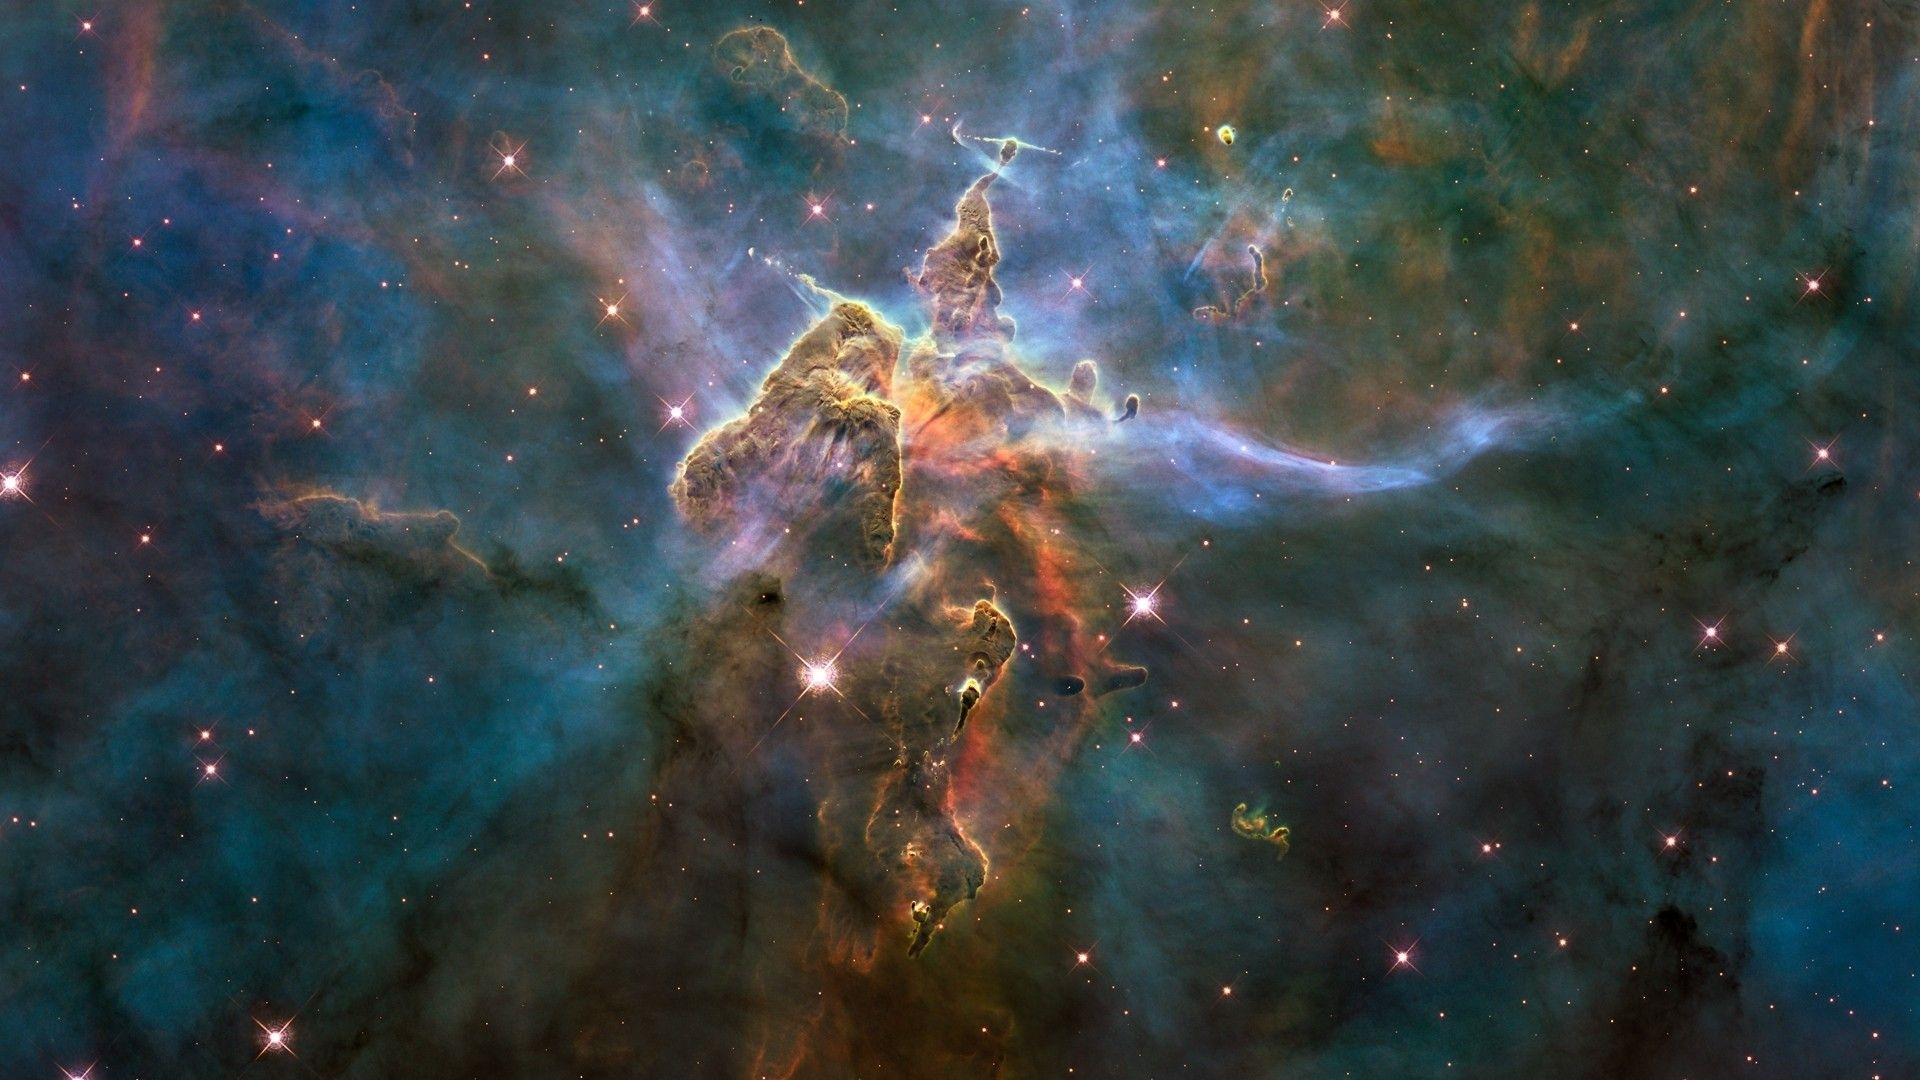 space wallpaper 1920x1080 nebula hd 1080p 12 hd wallpapers